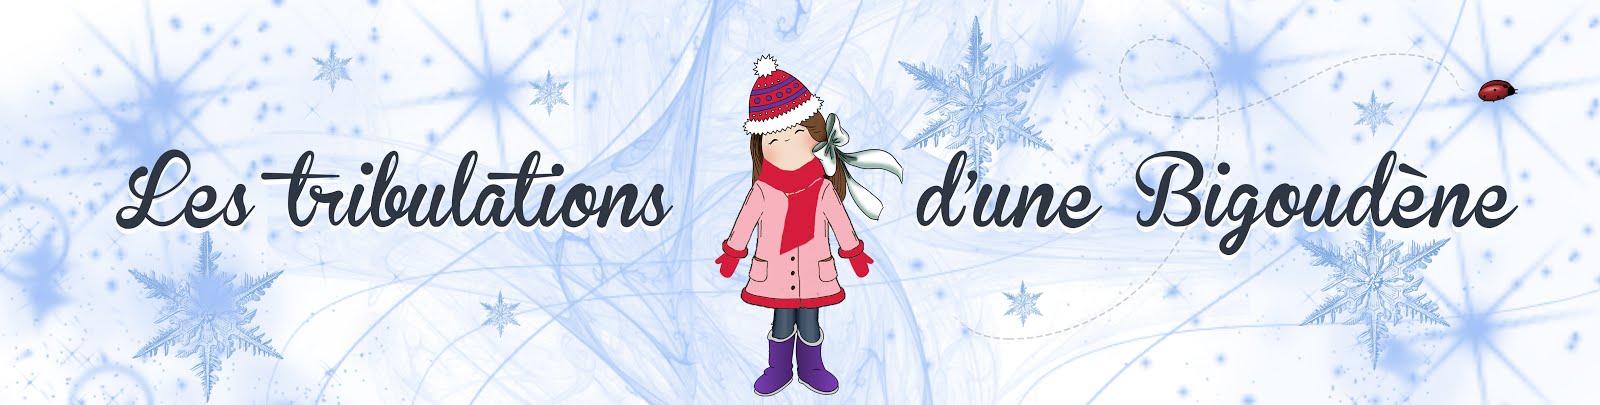 Lady Breizh - Les Tribulations d'une Bigoudène - Blog Lifestyle - Bretagne // Nantes